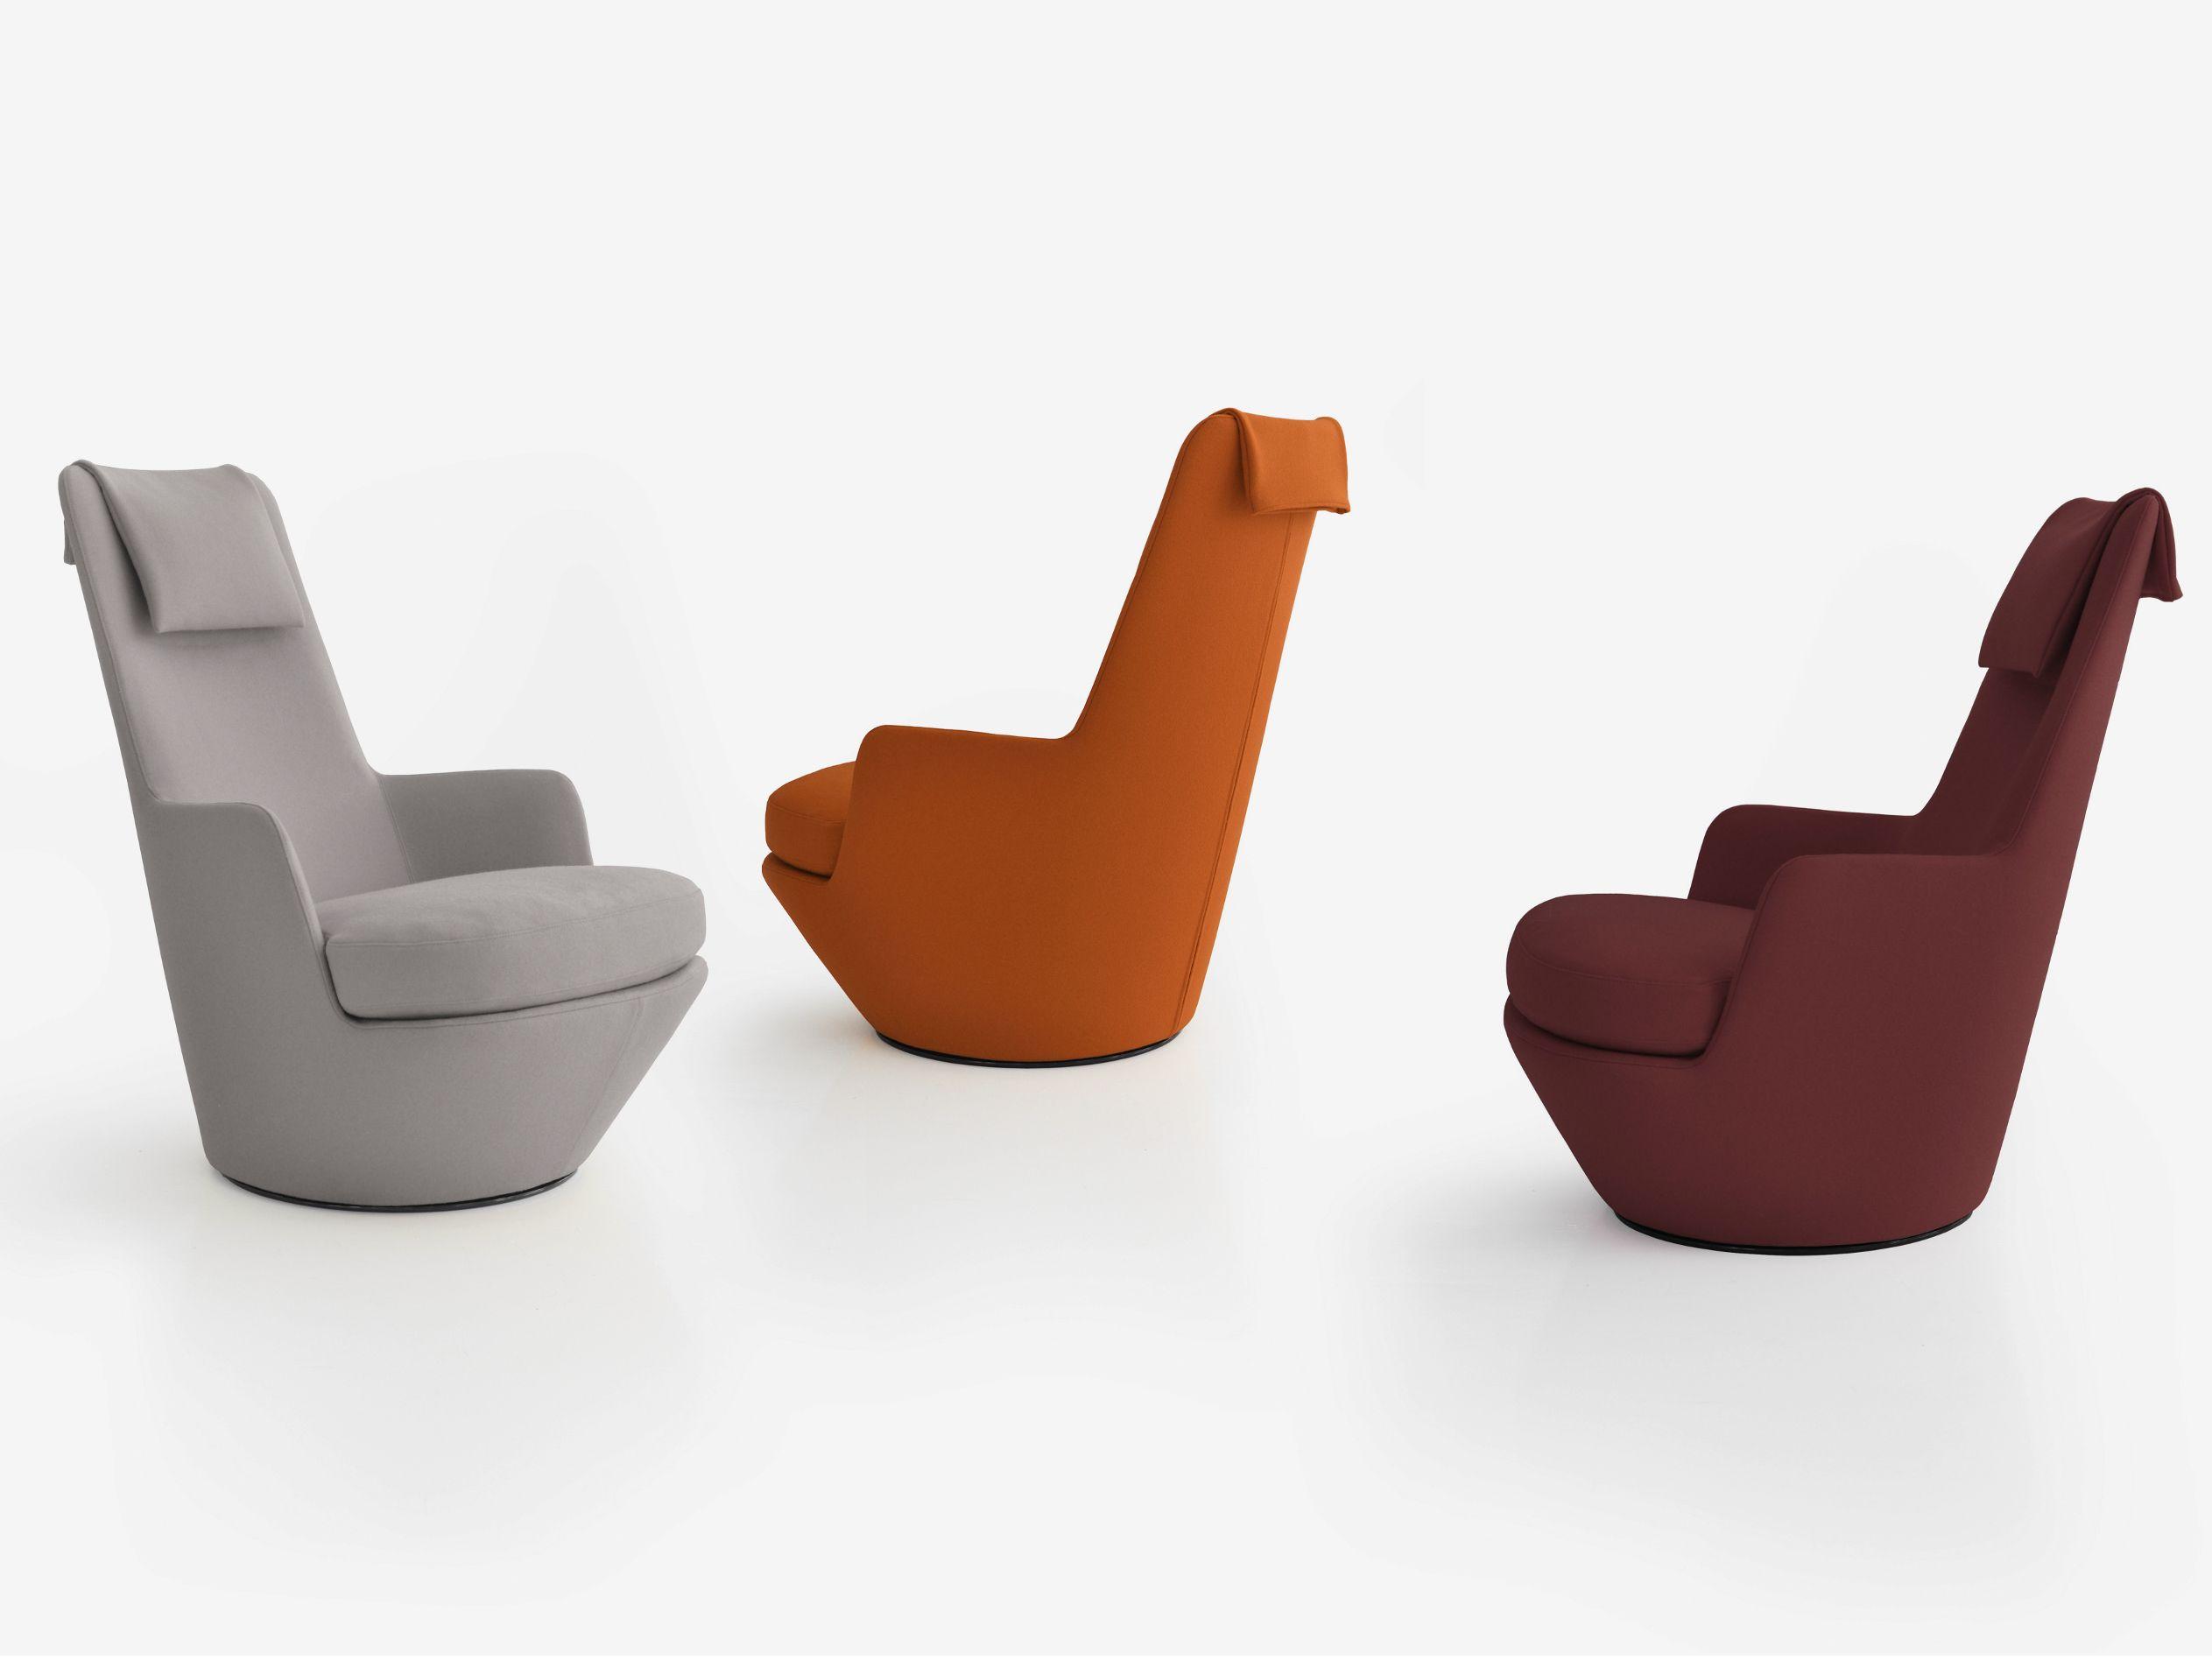 Highback swivel armchair HI TURN by BENSEN Chair